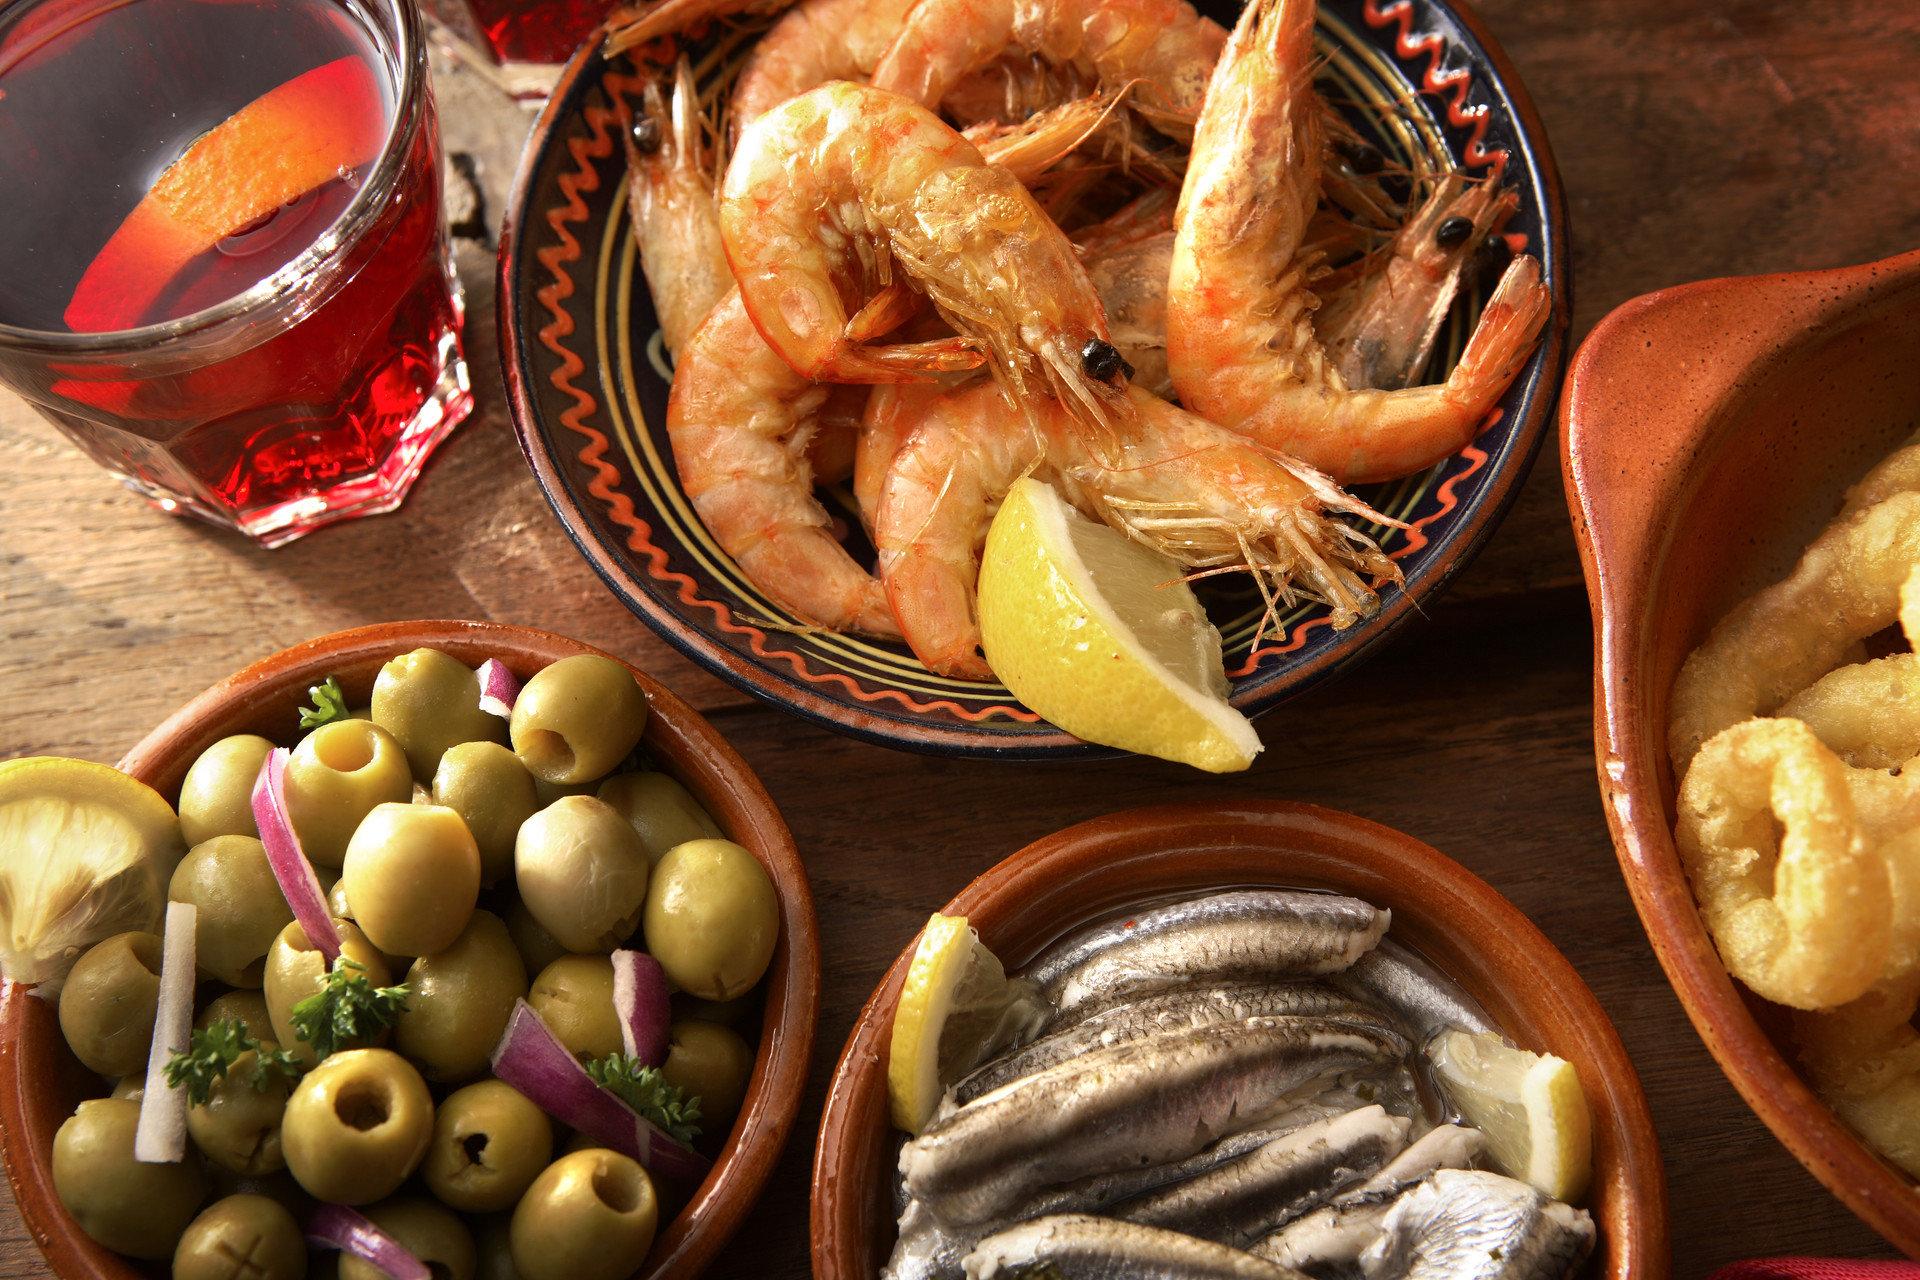 News Trip Ideas food dish cuisine meal produce asian food Seafood vegetable